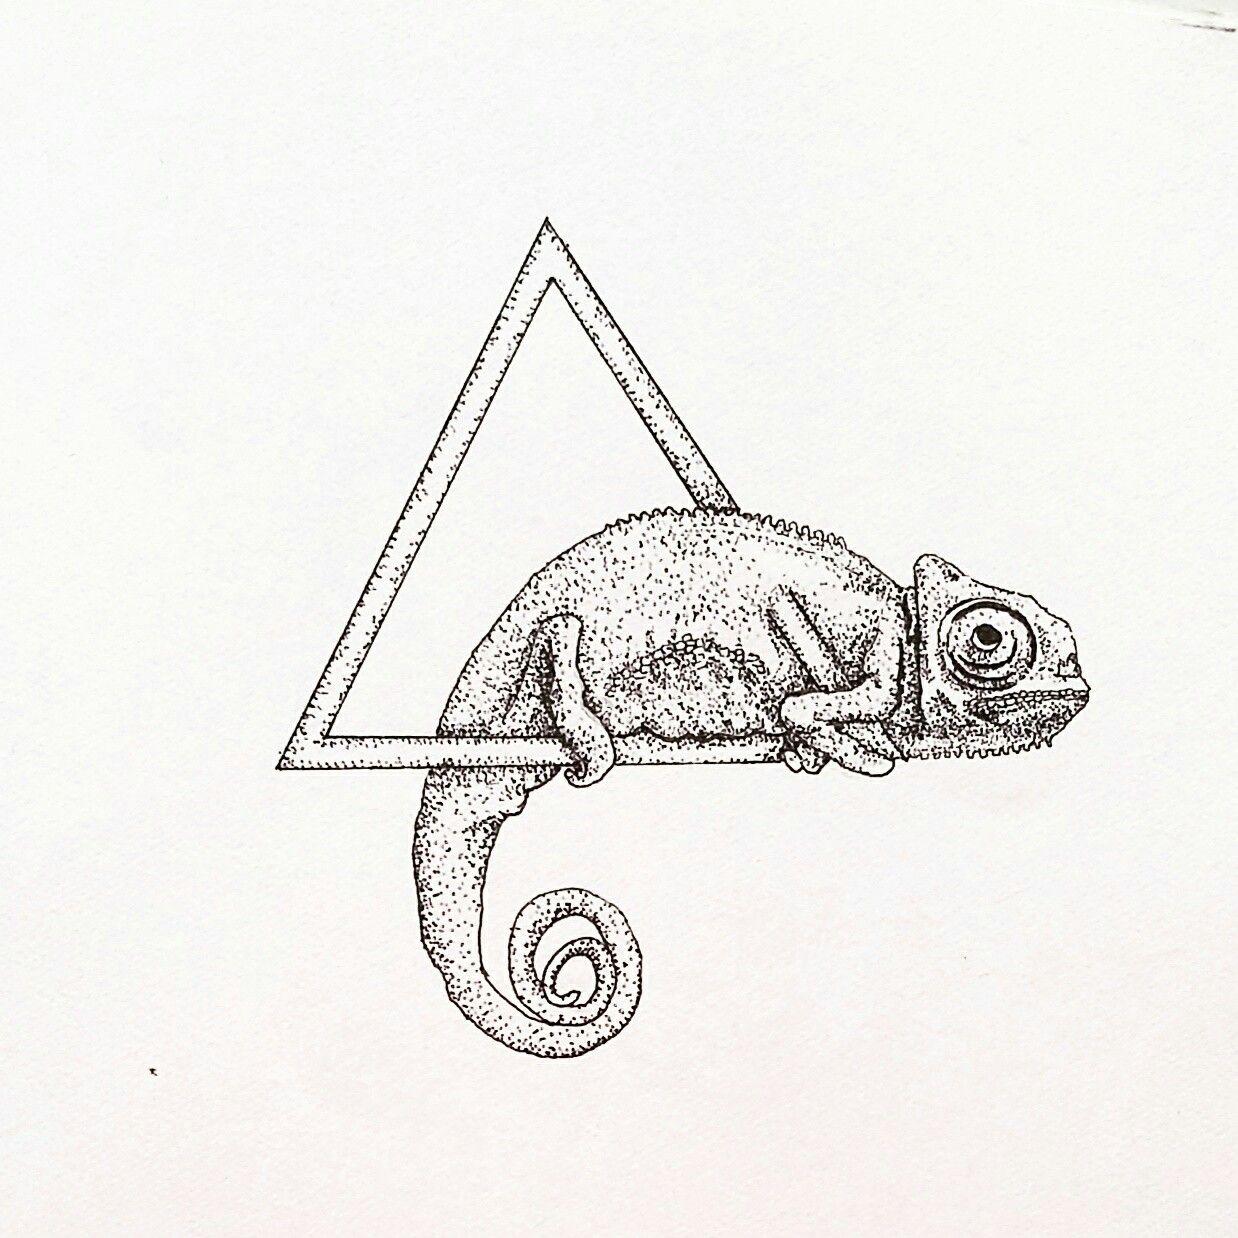 644133923 Dessin Cameleon, Pointillism Tattoo, Karma Chameleon, Future Tattoos,  Tattoos For Guys,